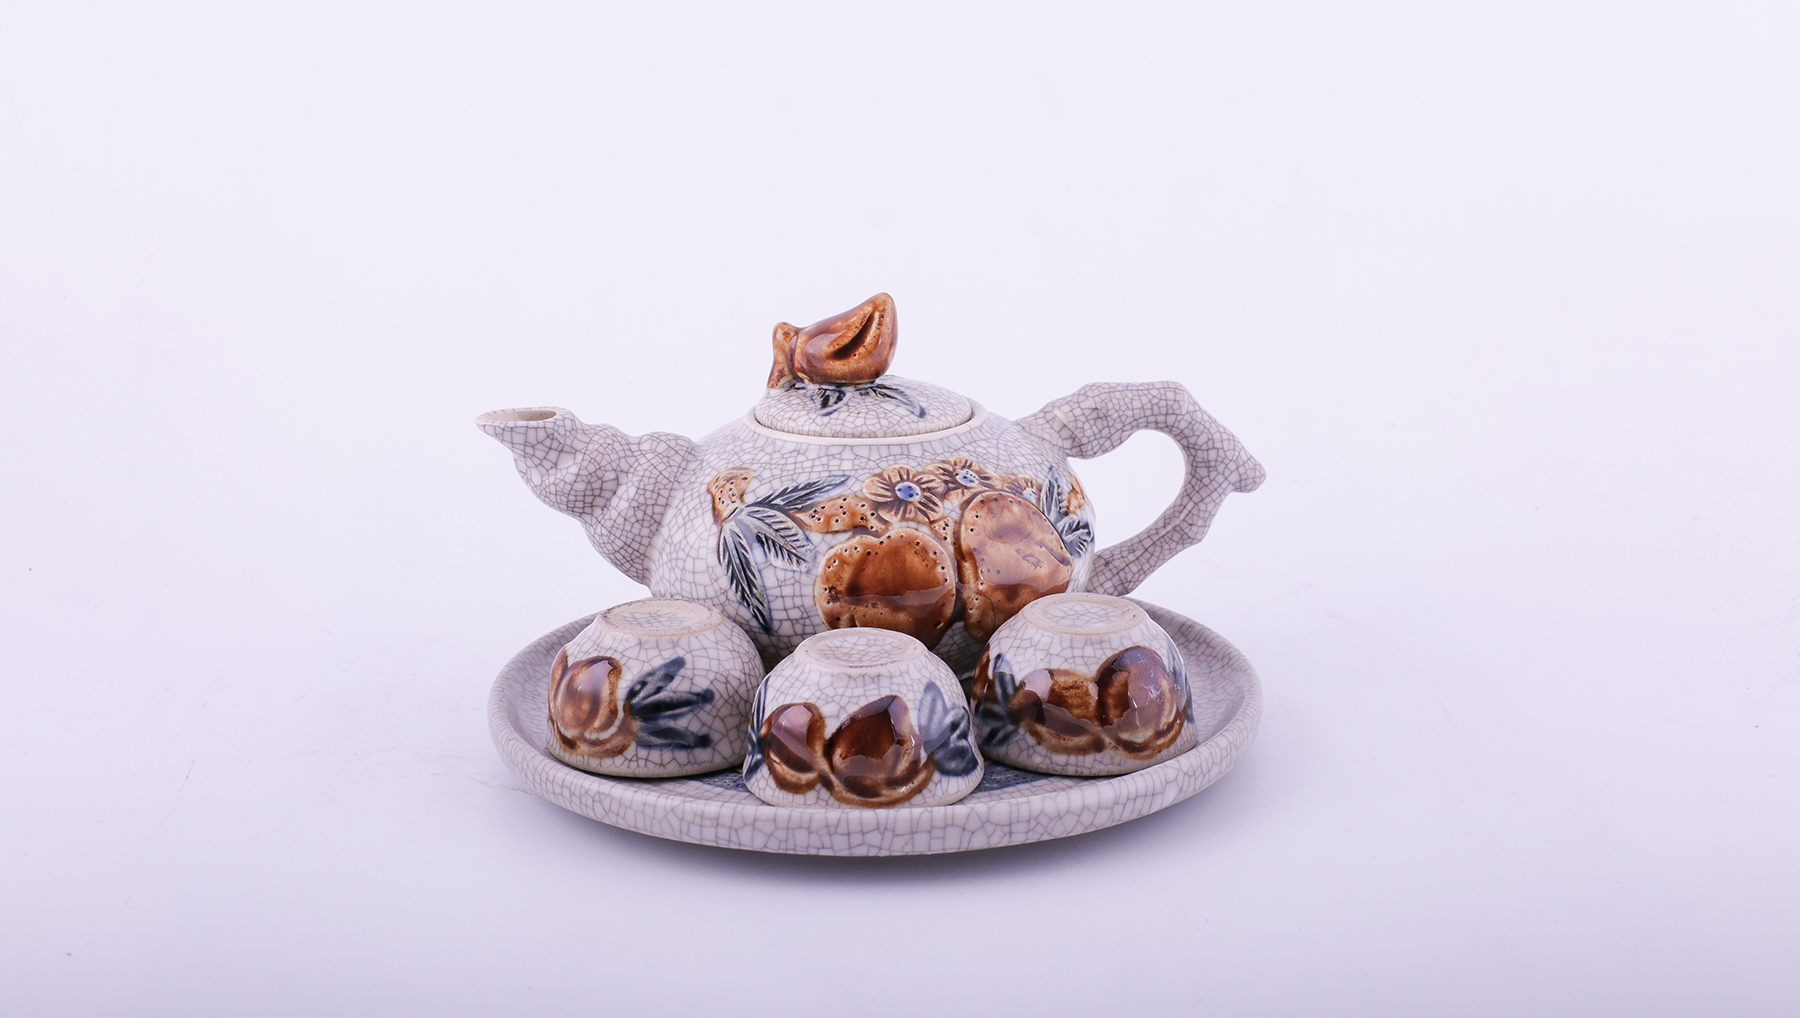 An intricately designed altar tea set from Bat Trang. Photo credit: xuonggombattrang.vn